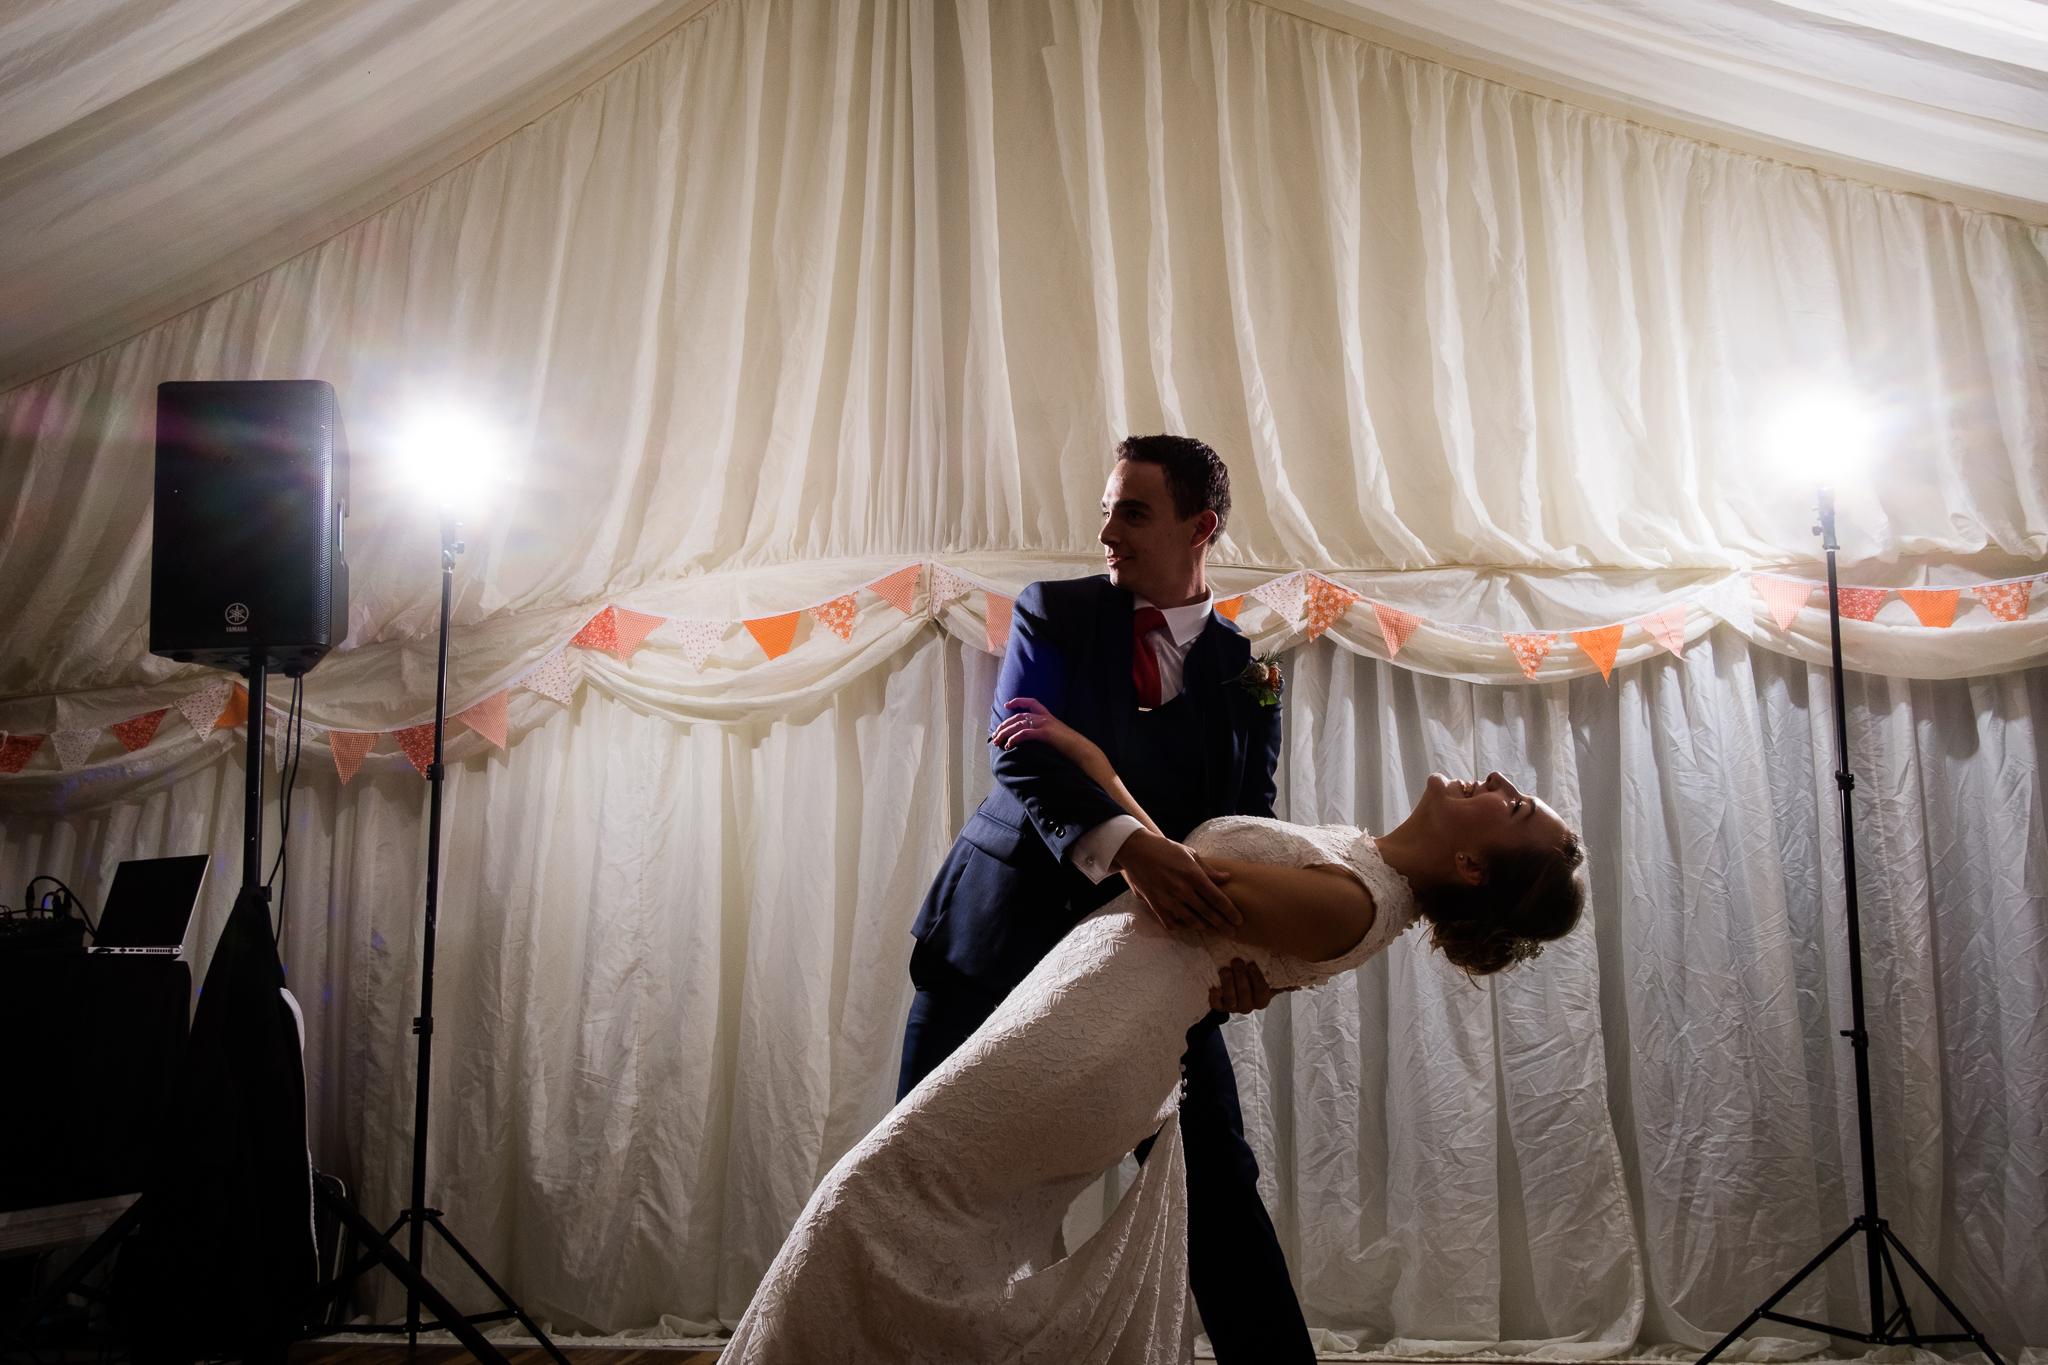 Relaxed Documentary Wedding Photography at The Wizard Inn, Alderley Edge Cheshire - Jenny Harper-77.jpg